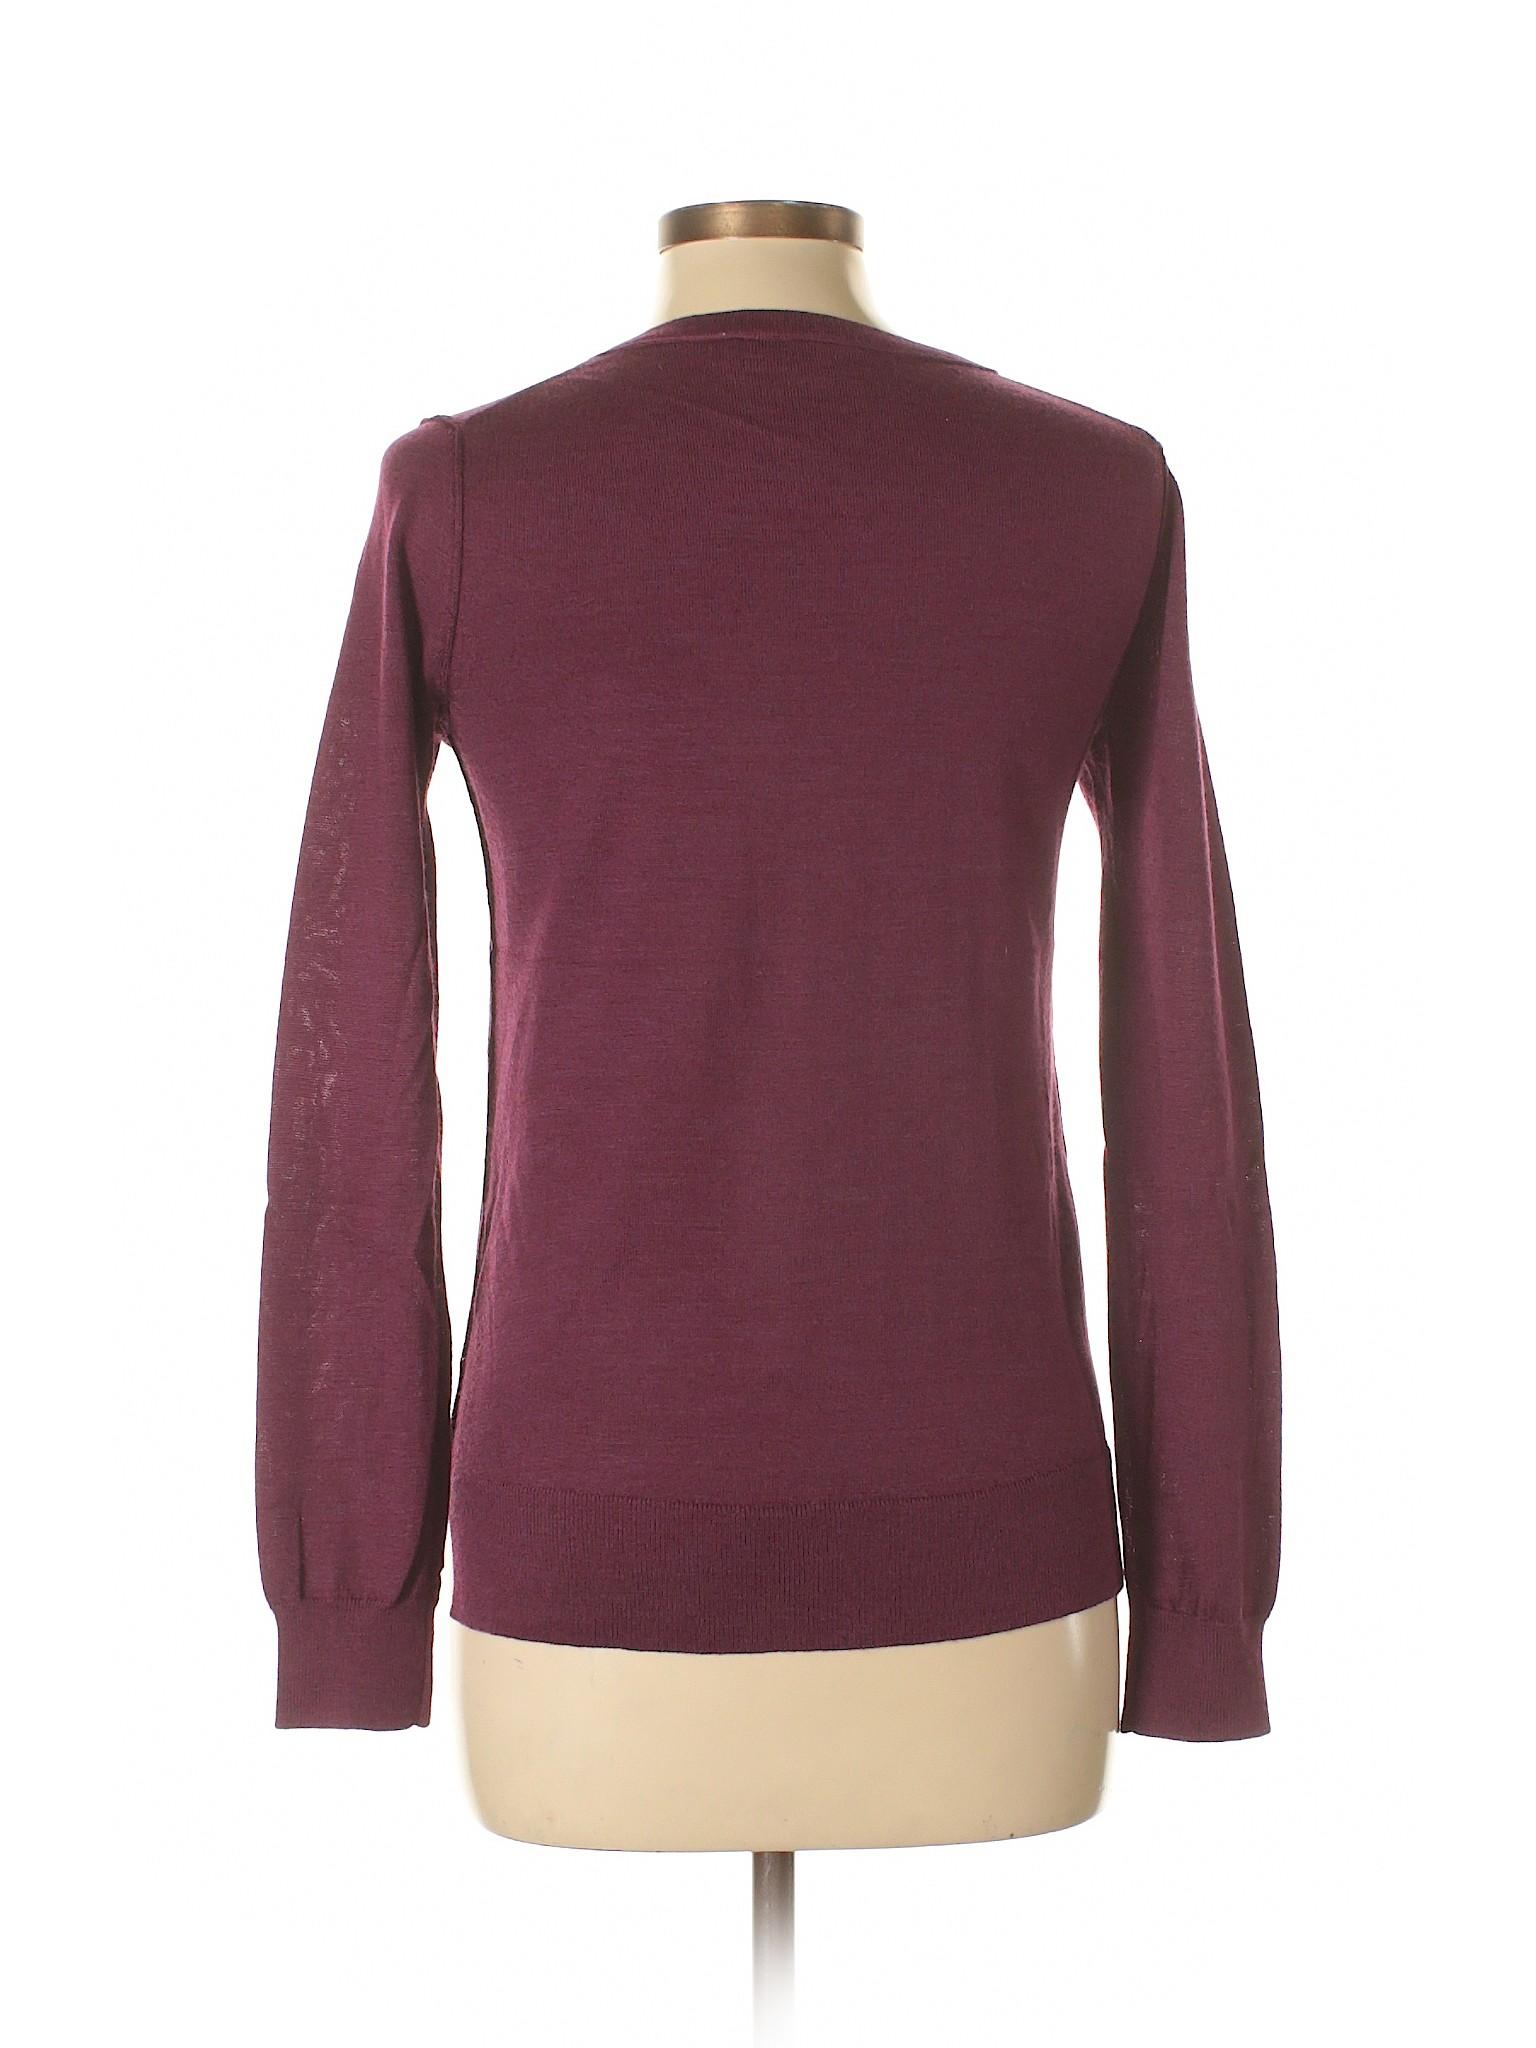 Boutique Gap Sweater Wool Boutique Pullover Gap 4qBaP64